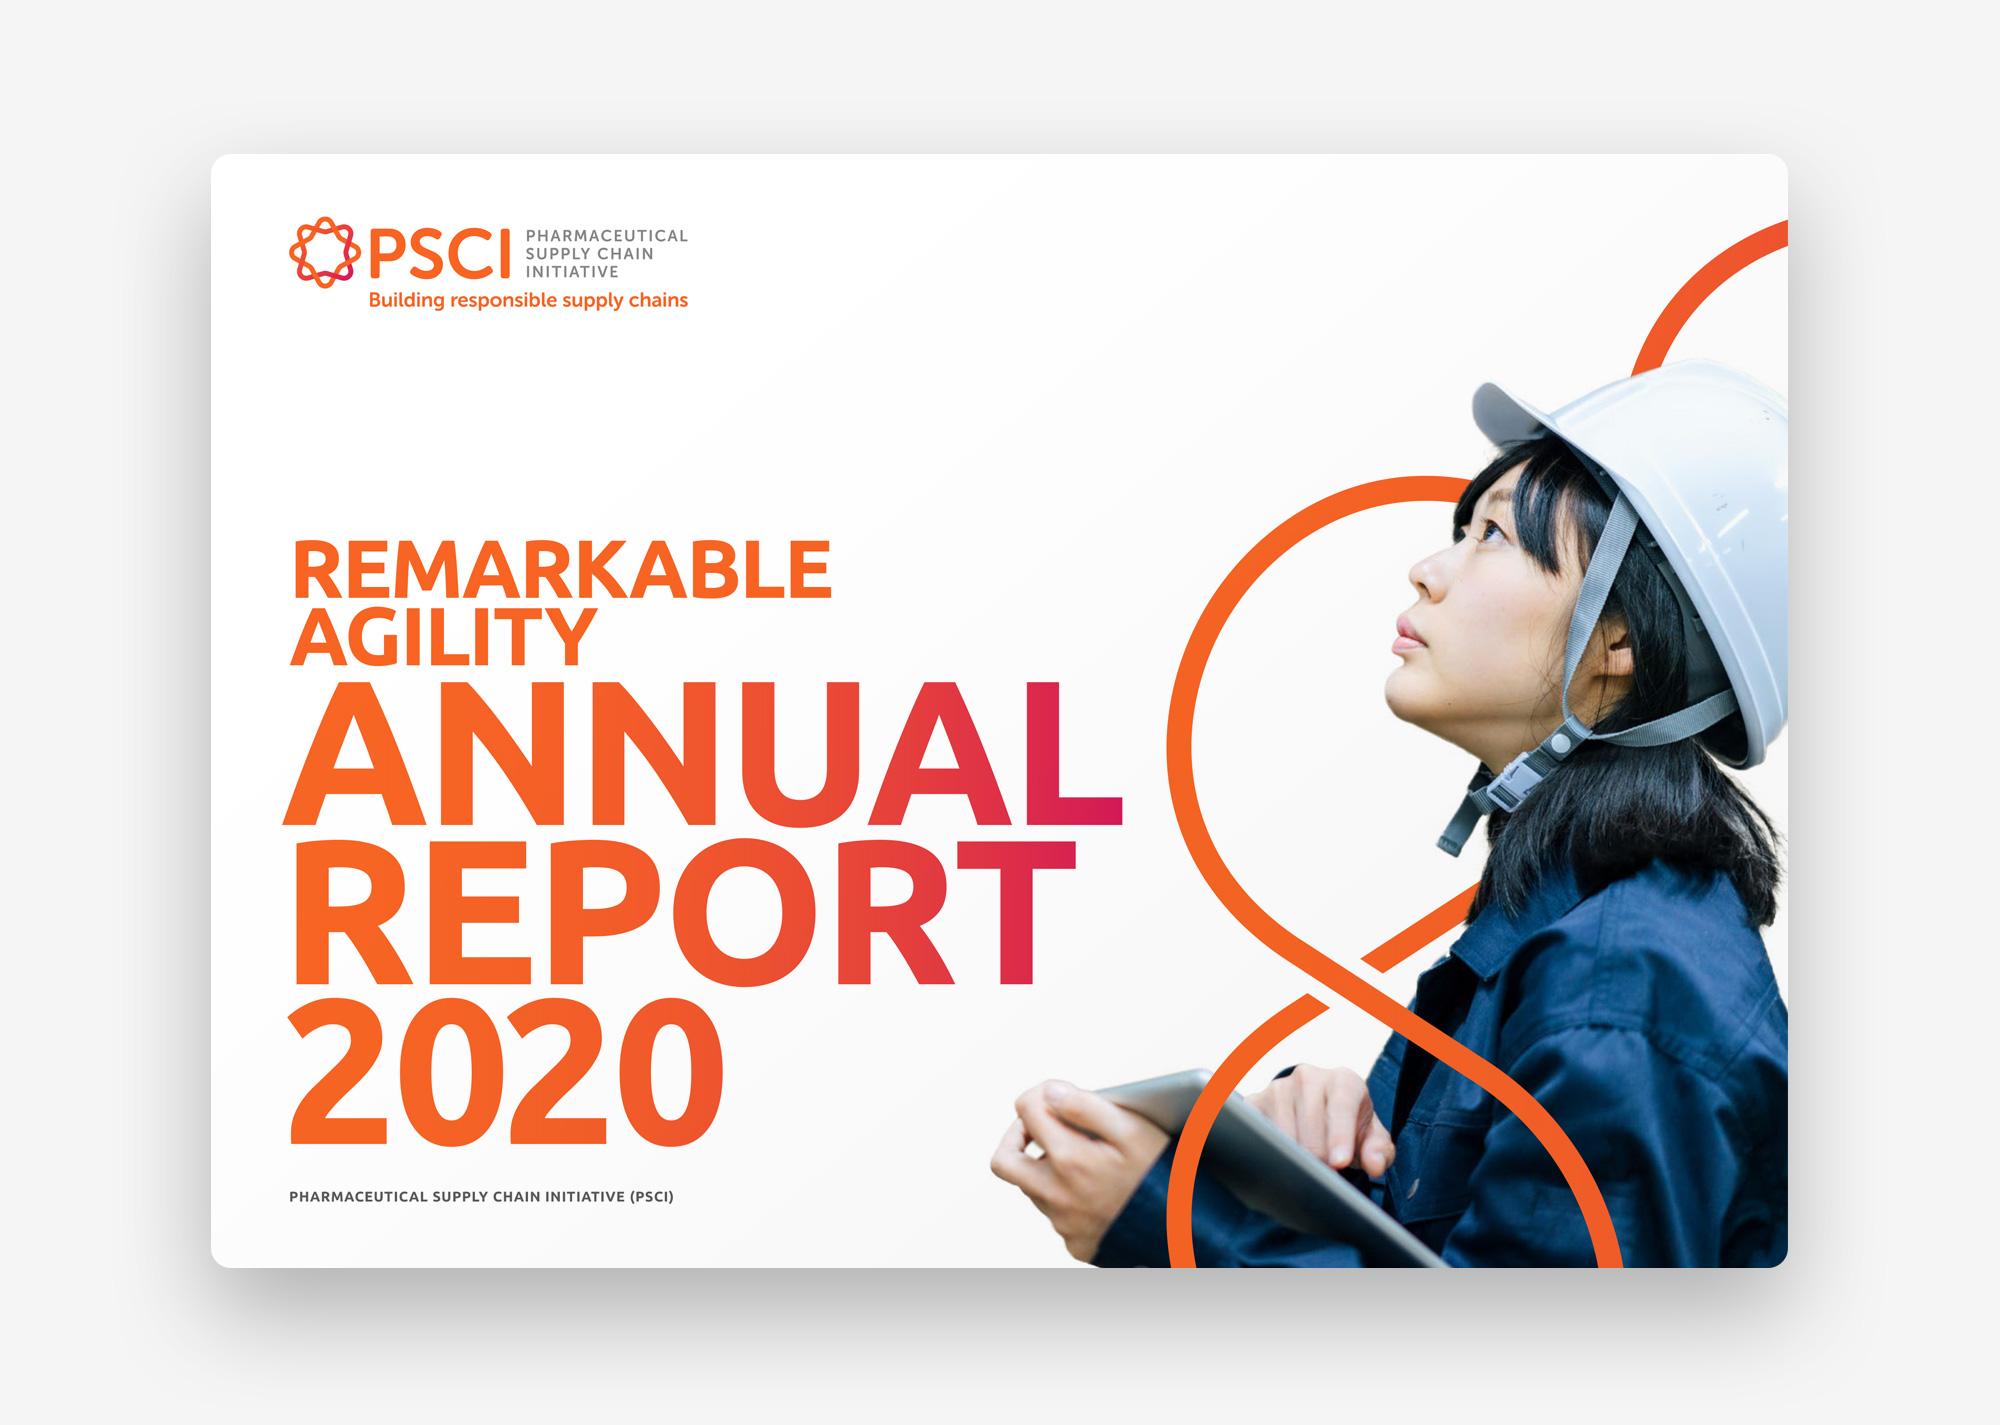 PSCI Annual Report 2020 cover